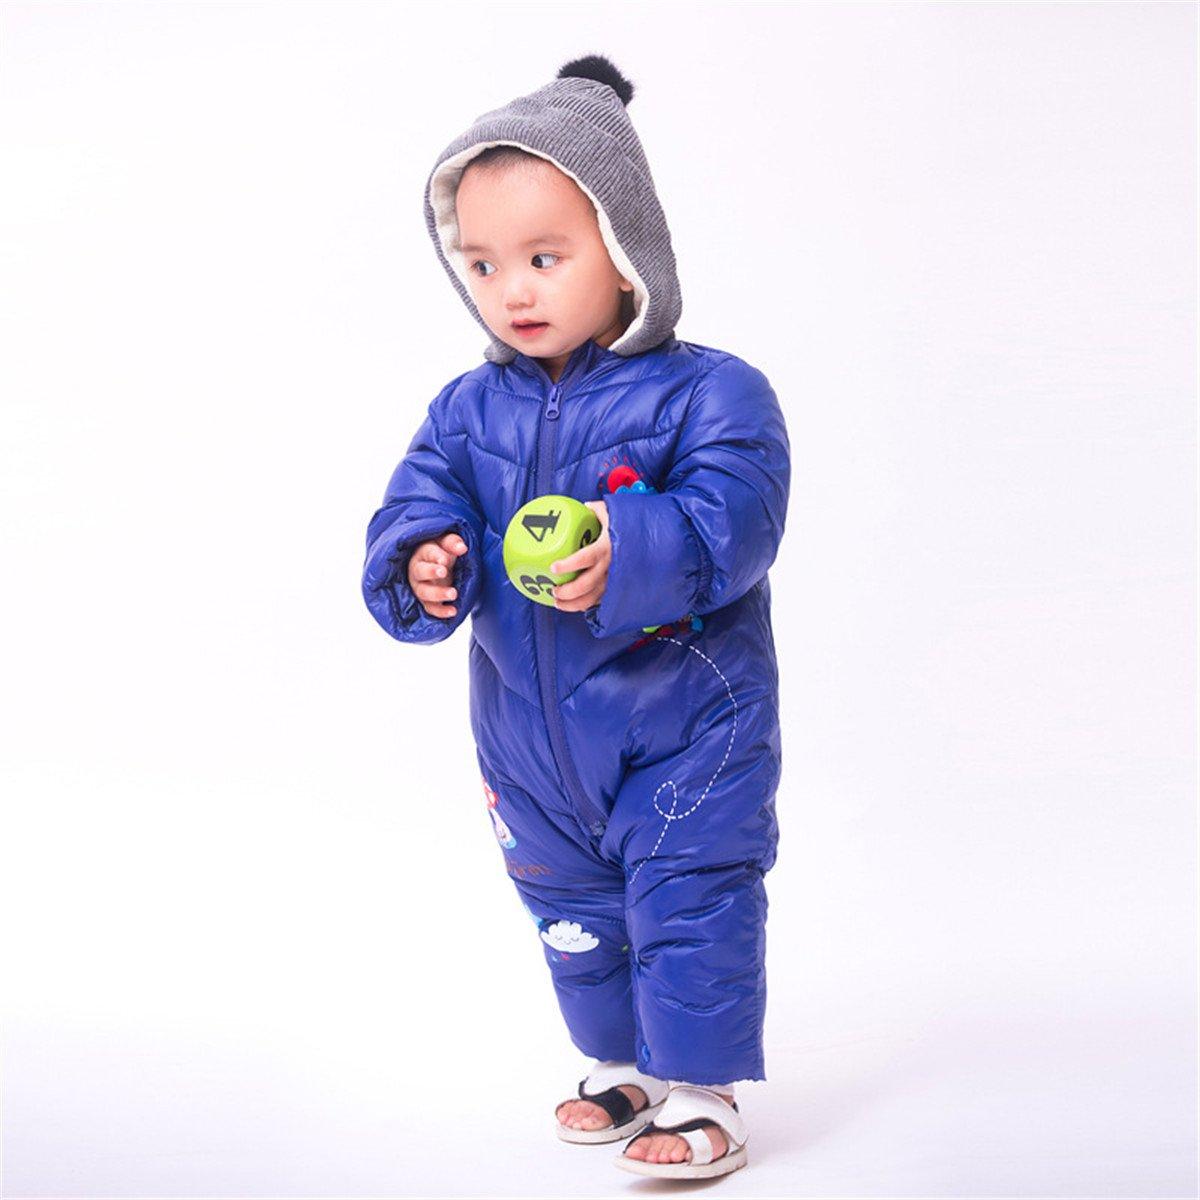 JELEUON Baby Girls Boys One Piece Winter Warm Hoodie Romper Snowsuit Jumpsuit